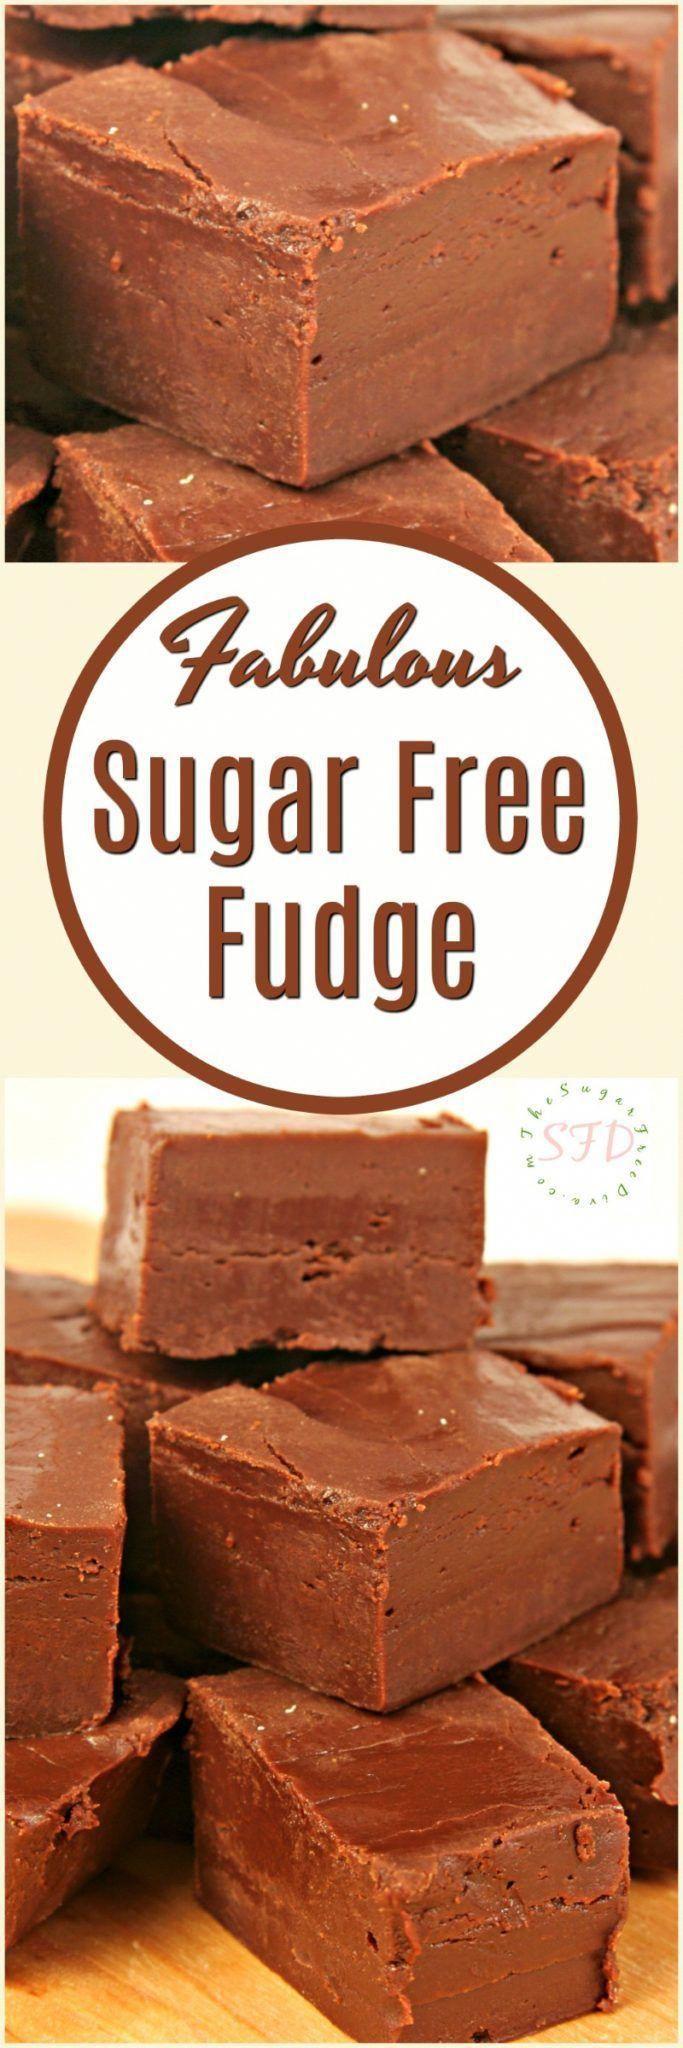 FABULOUS Sugar Free Fudge #fudge #sugarfree #holidays #desserts  #Chocolate  #yummy #popular #trending #pinterest #sugarfreedesserts